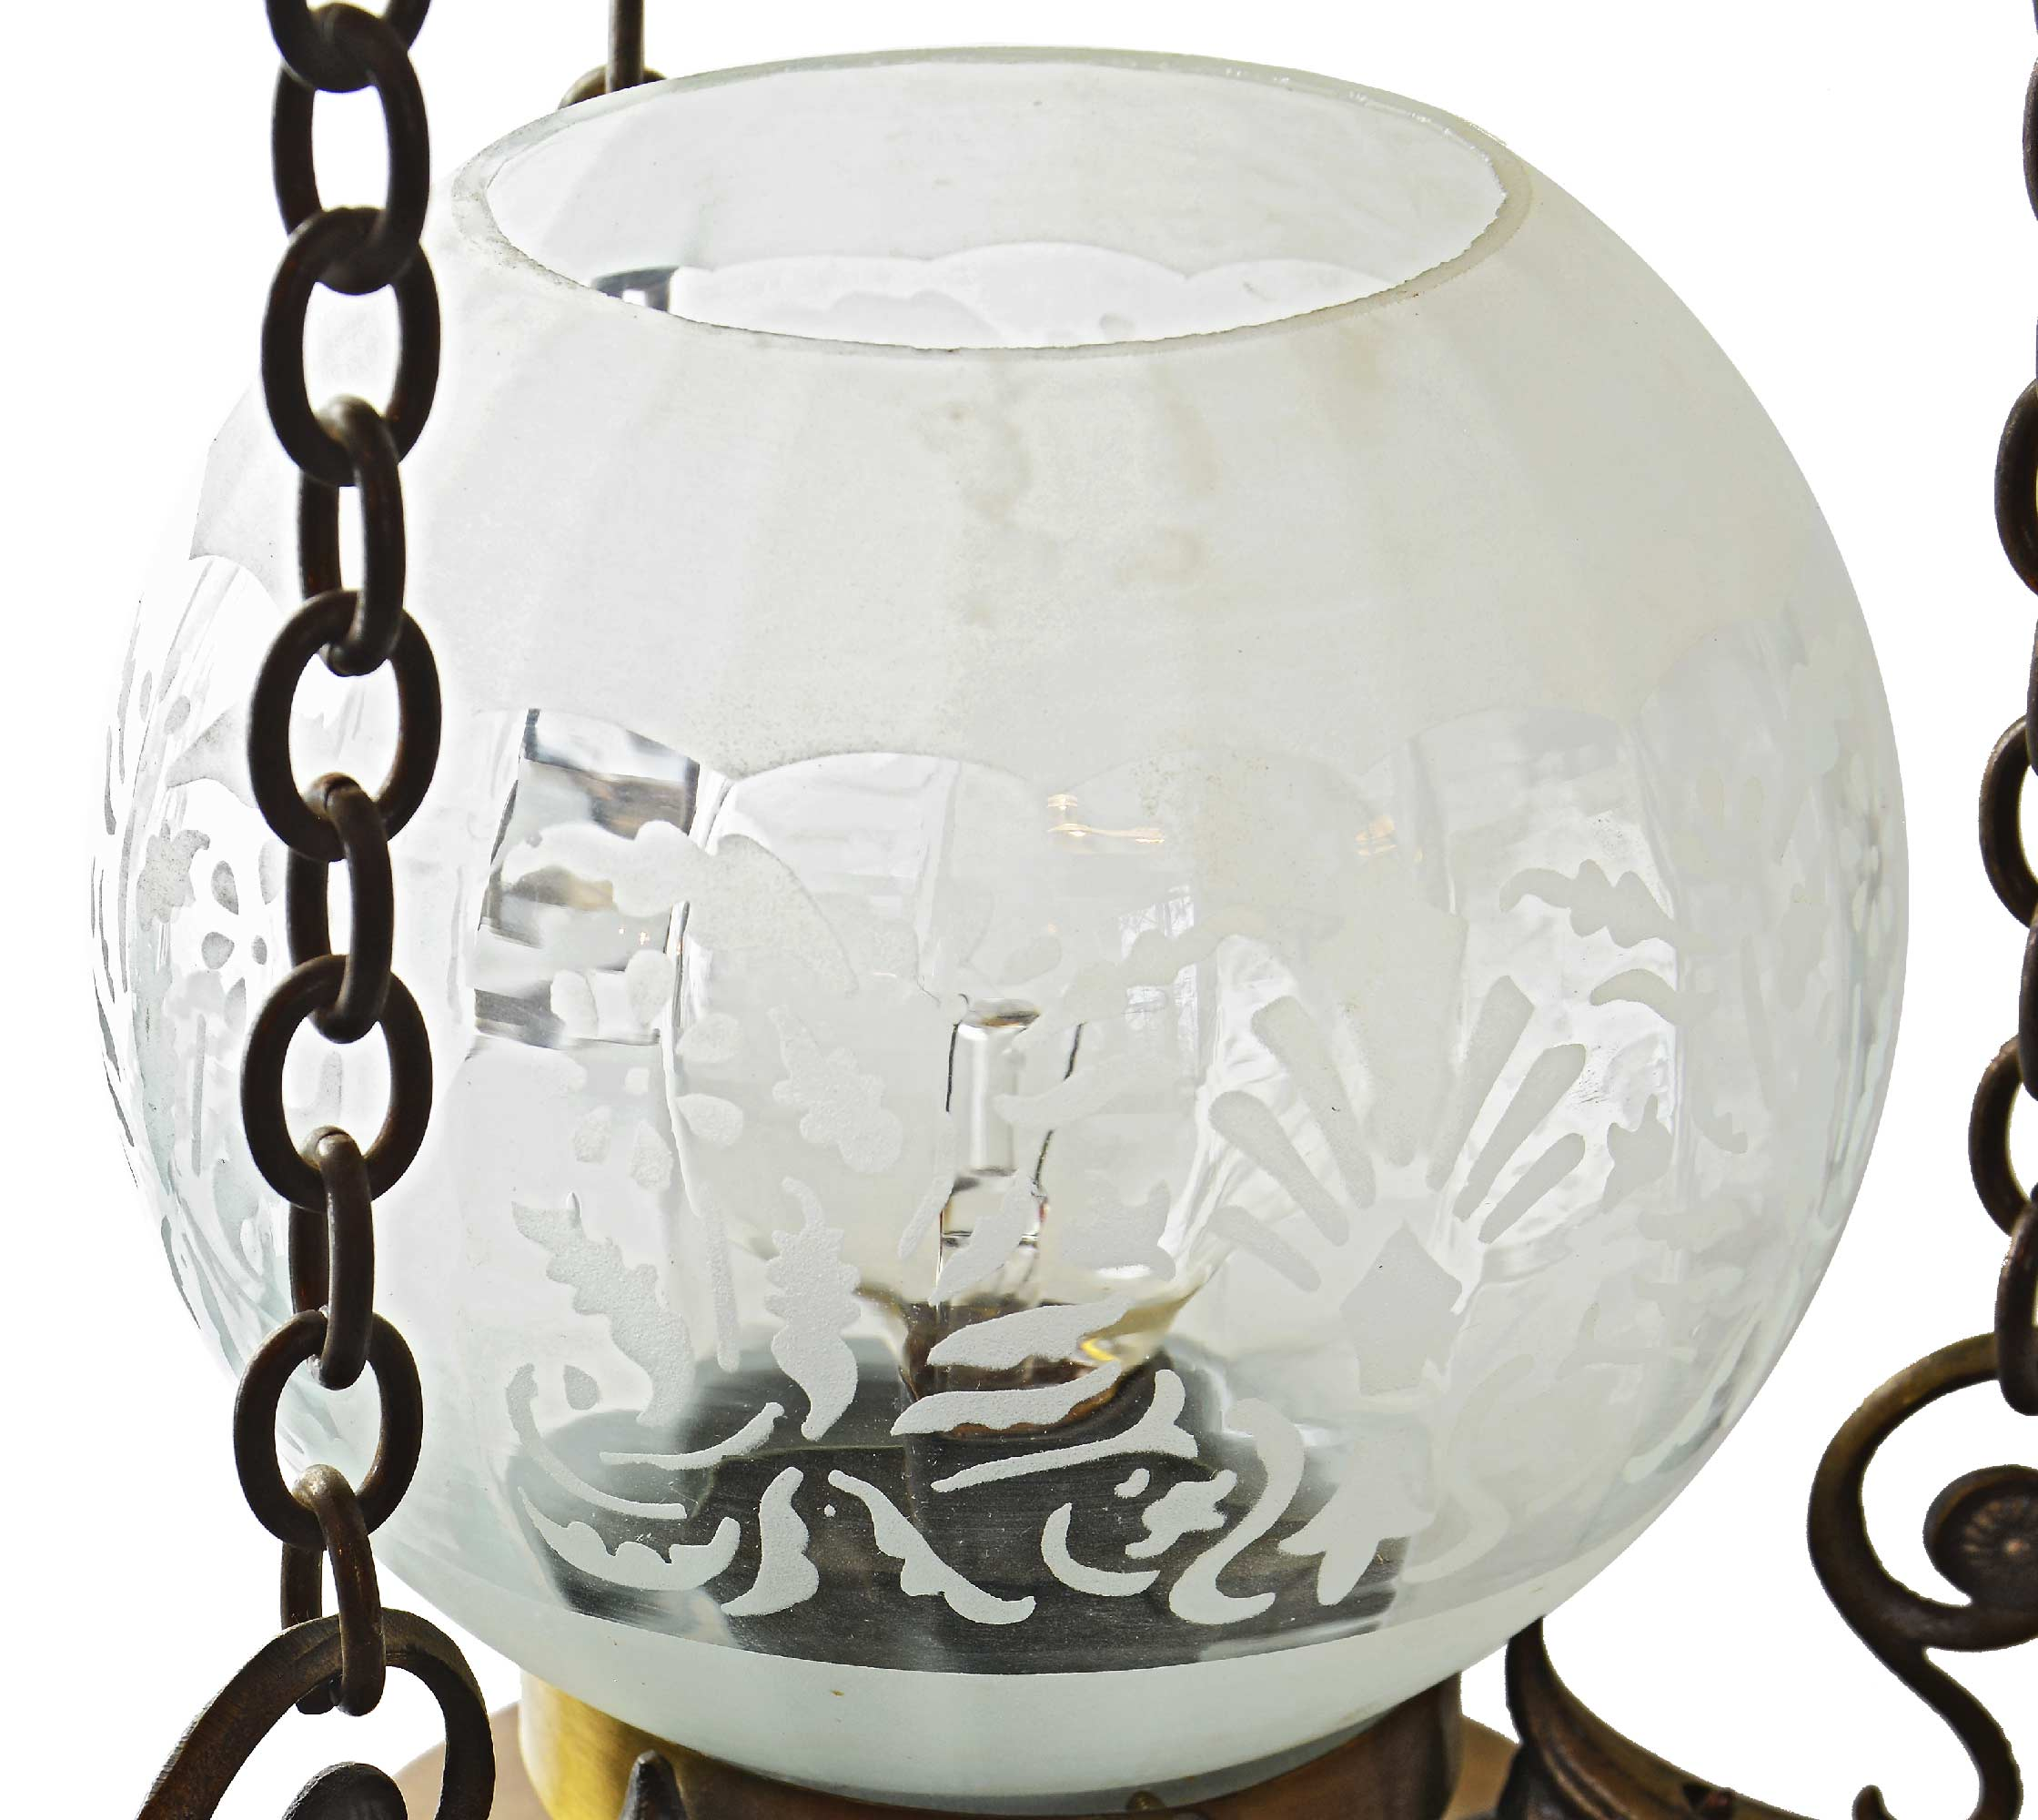 46814-brass-3-chain-neoclassical-pendant-globe-detail.jpg